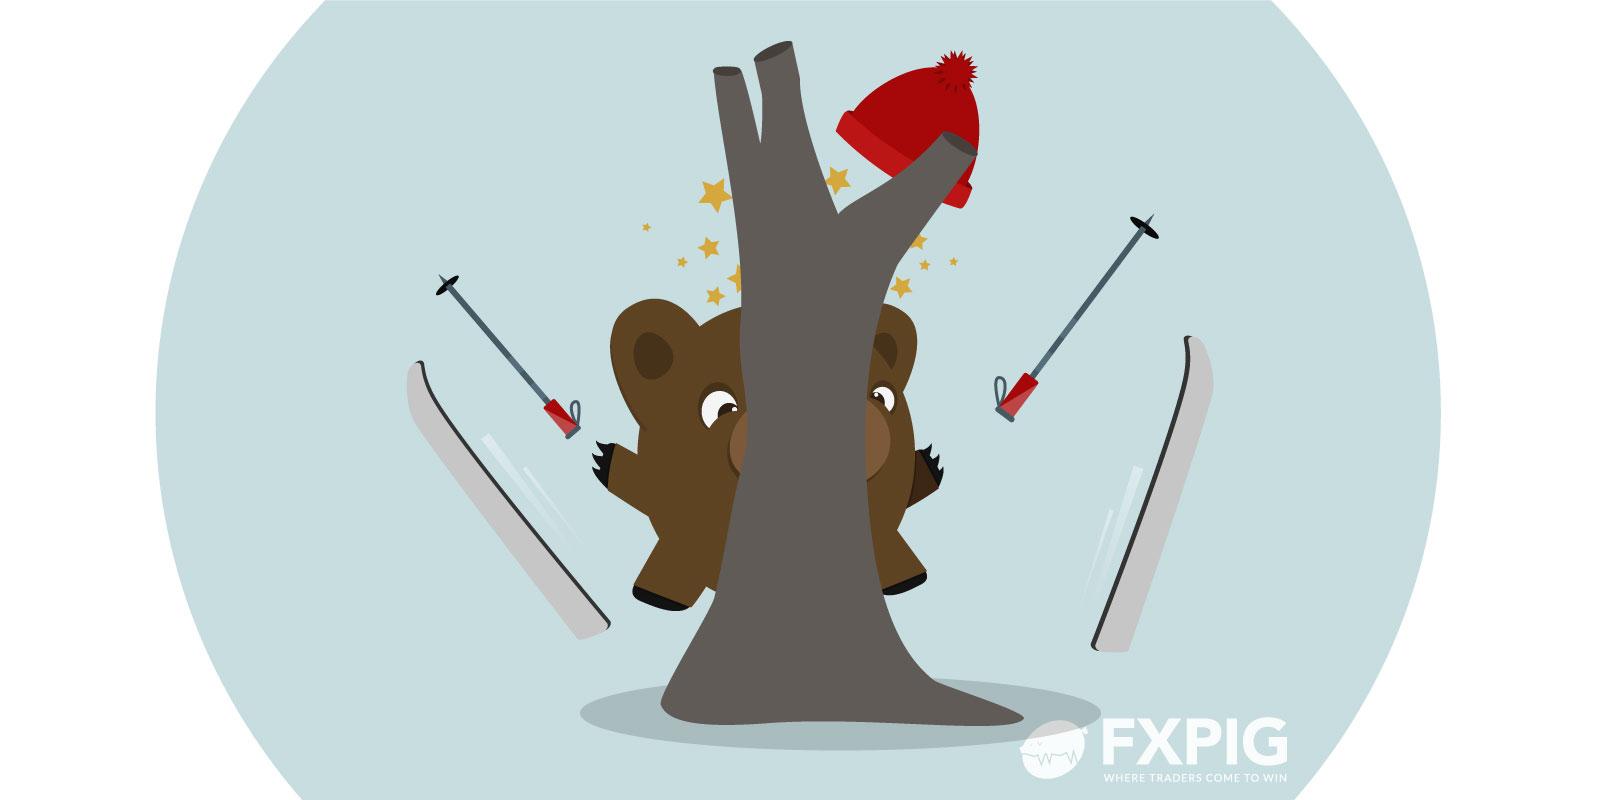 Bulls_bears_Forex_FXPIG_tech-targets-11.03.2019_FXPIG